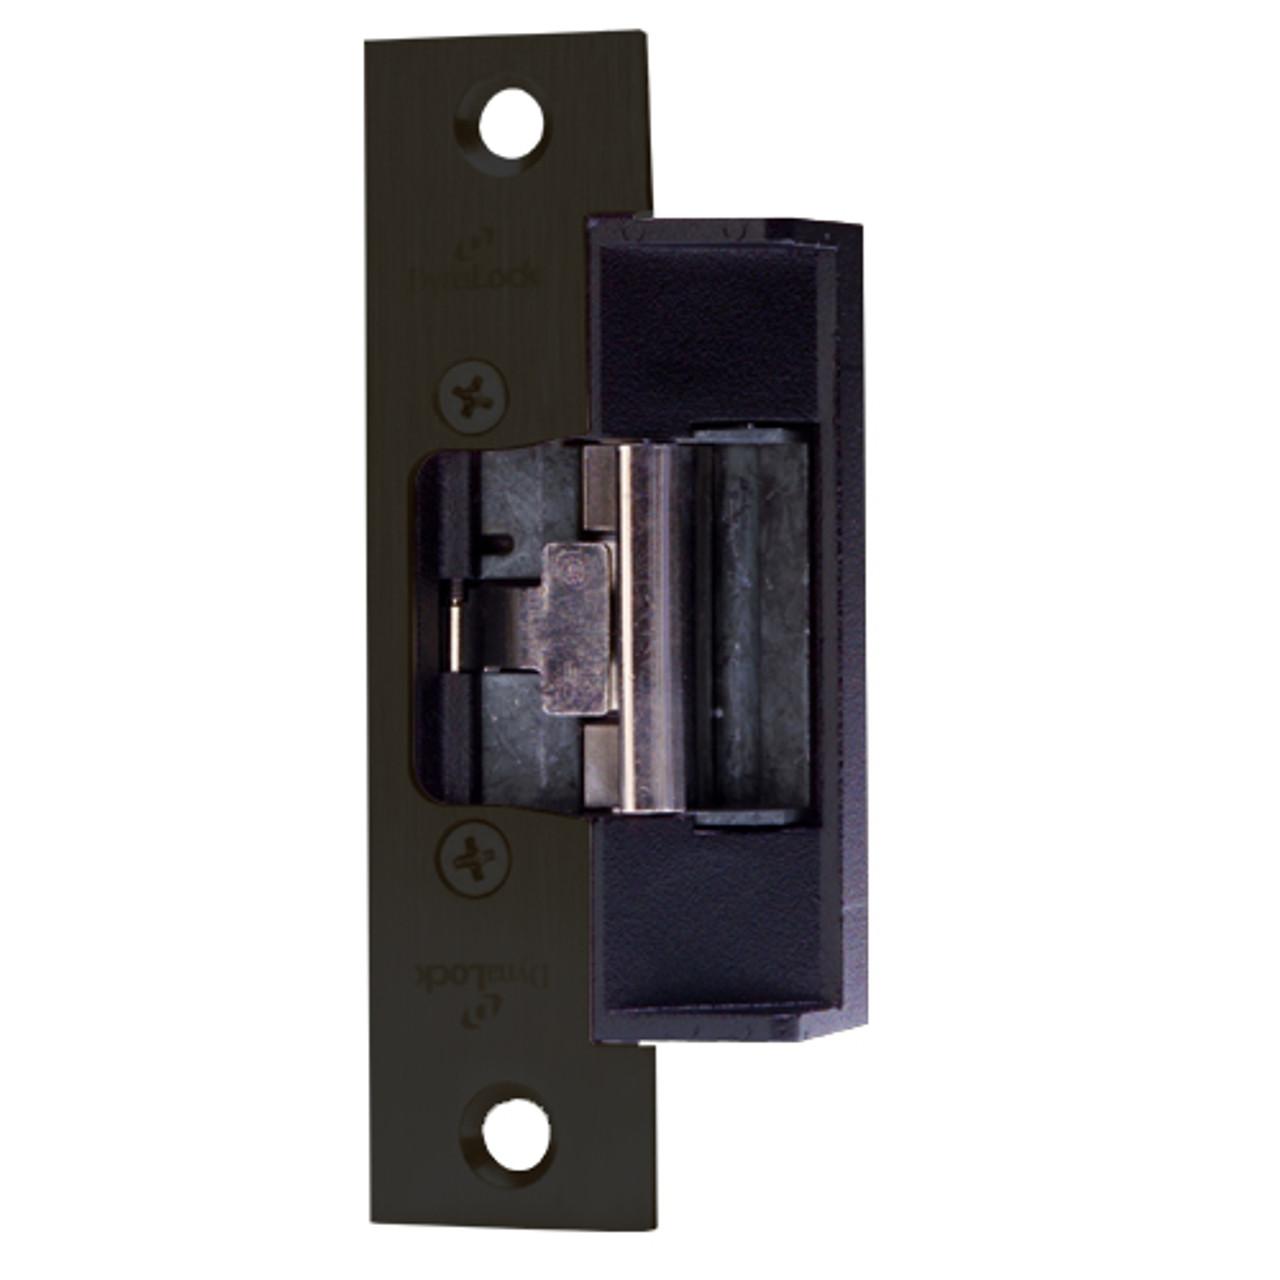 1614S-US10B DynaLock 1600 Series Electric Strike for Standard Profile in Oil Rubbed Bronze